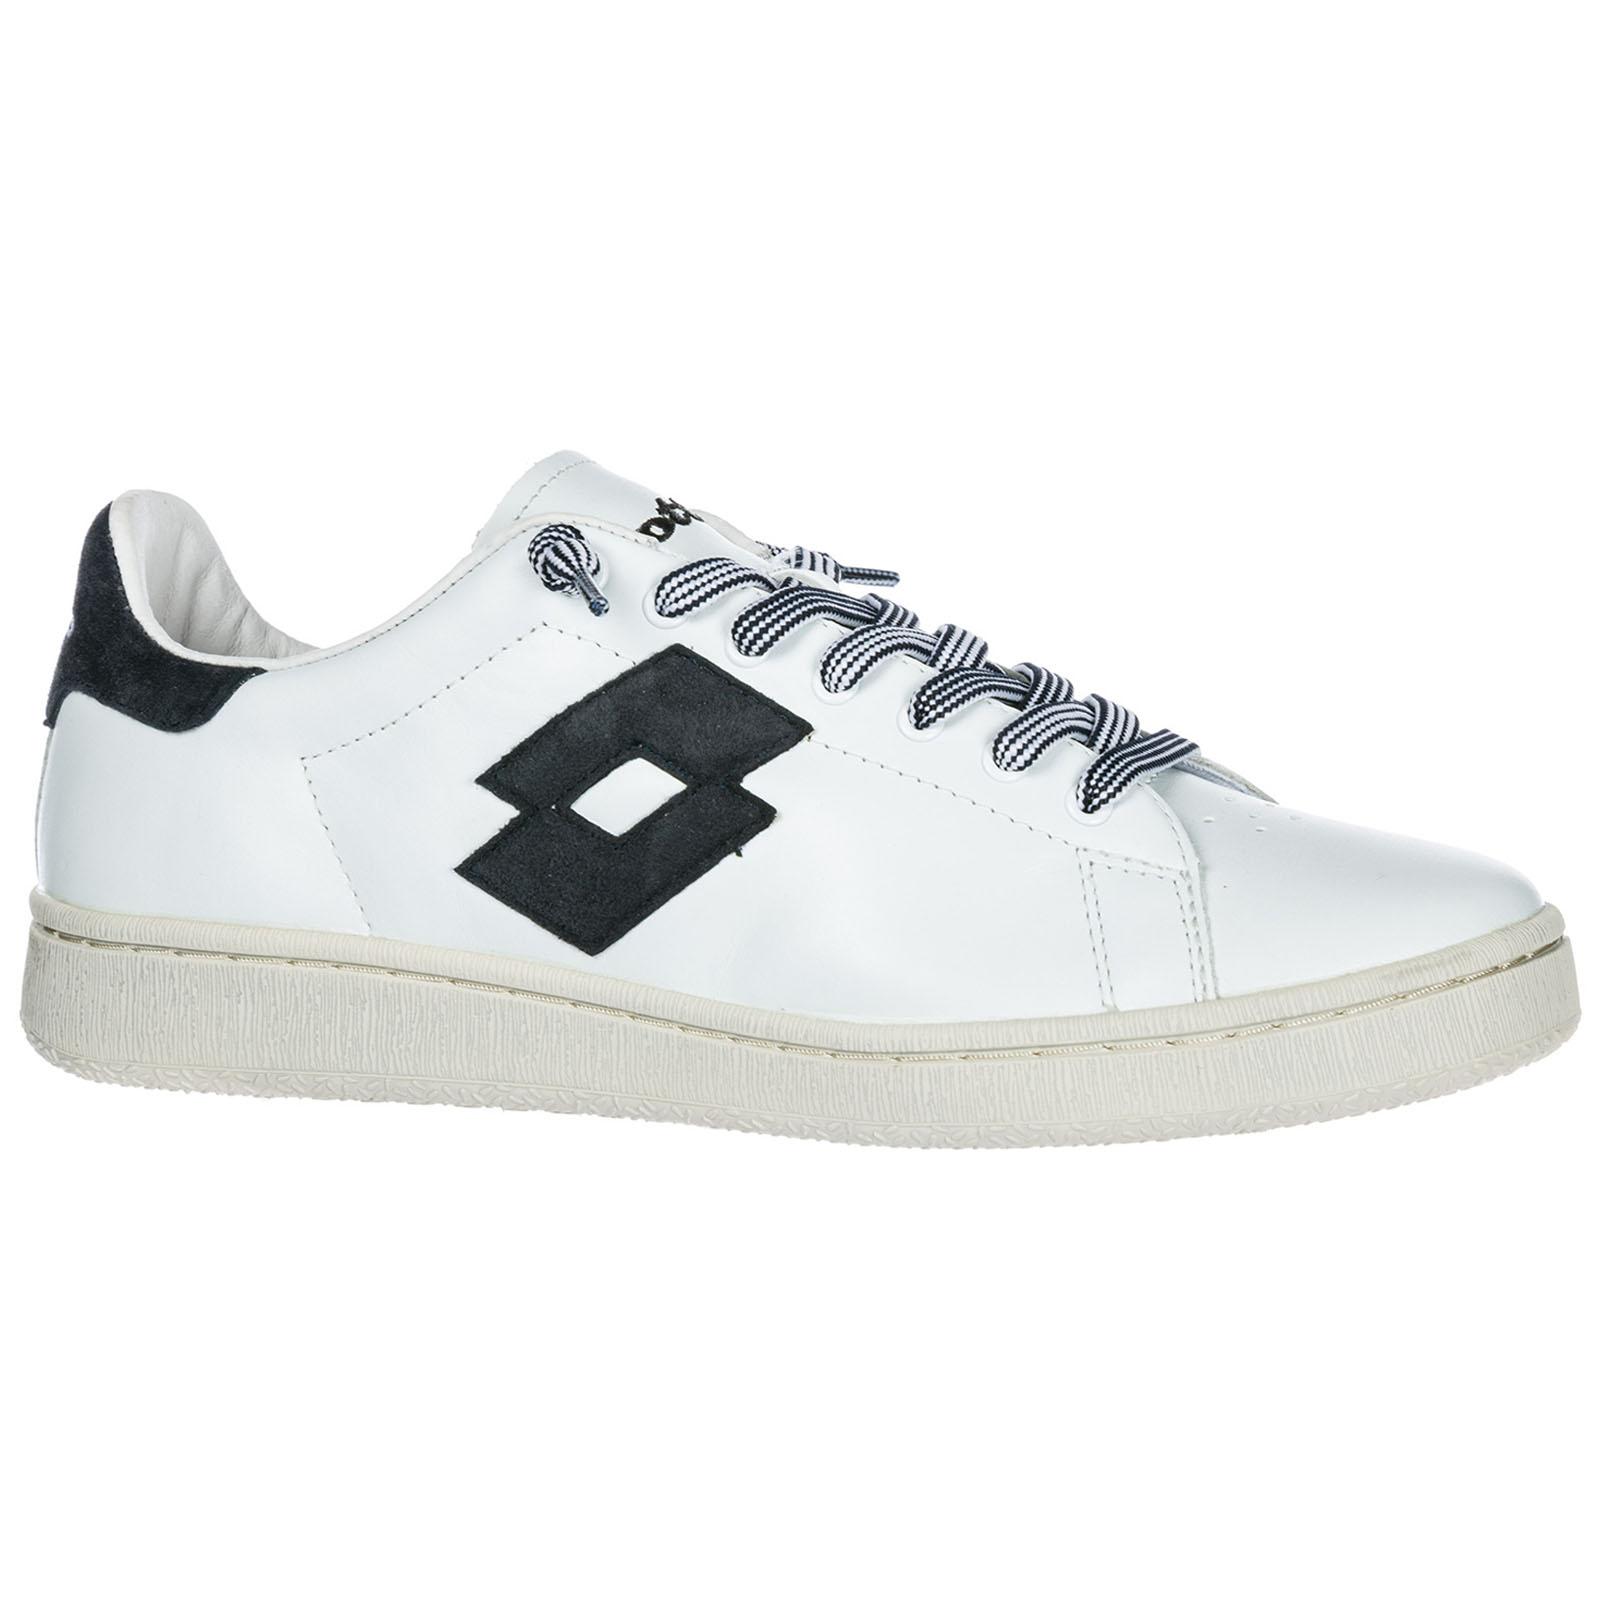 Dark Lotto White Navy Sneakers Leggenda T0811 Autograph BP70Wqq6A